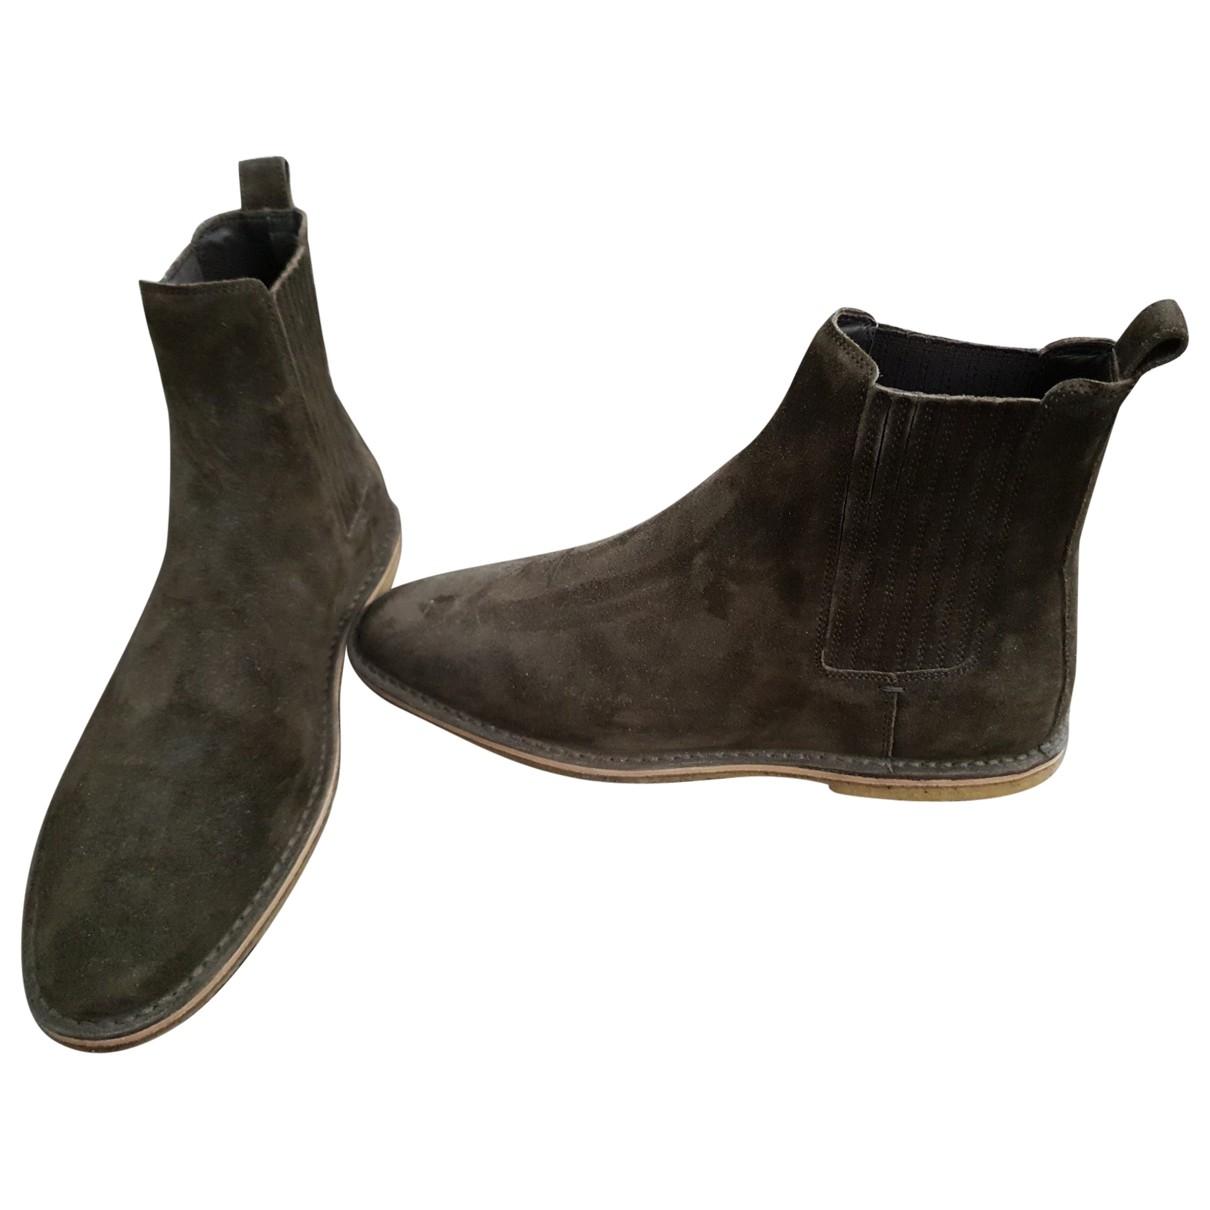 Saint Laurent \N Brown Suede Boots for Men 43 EU